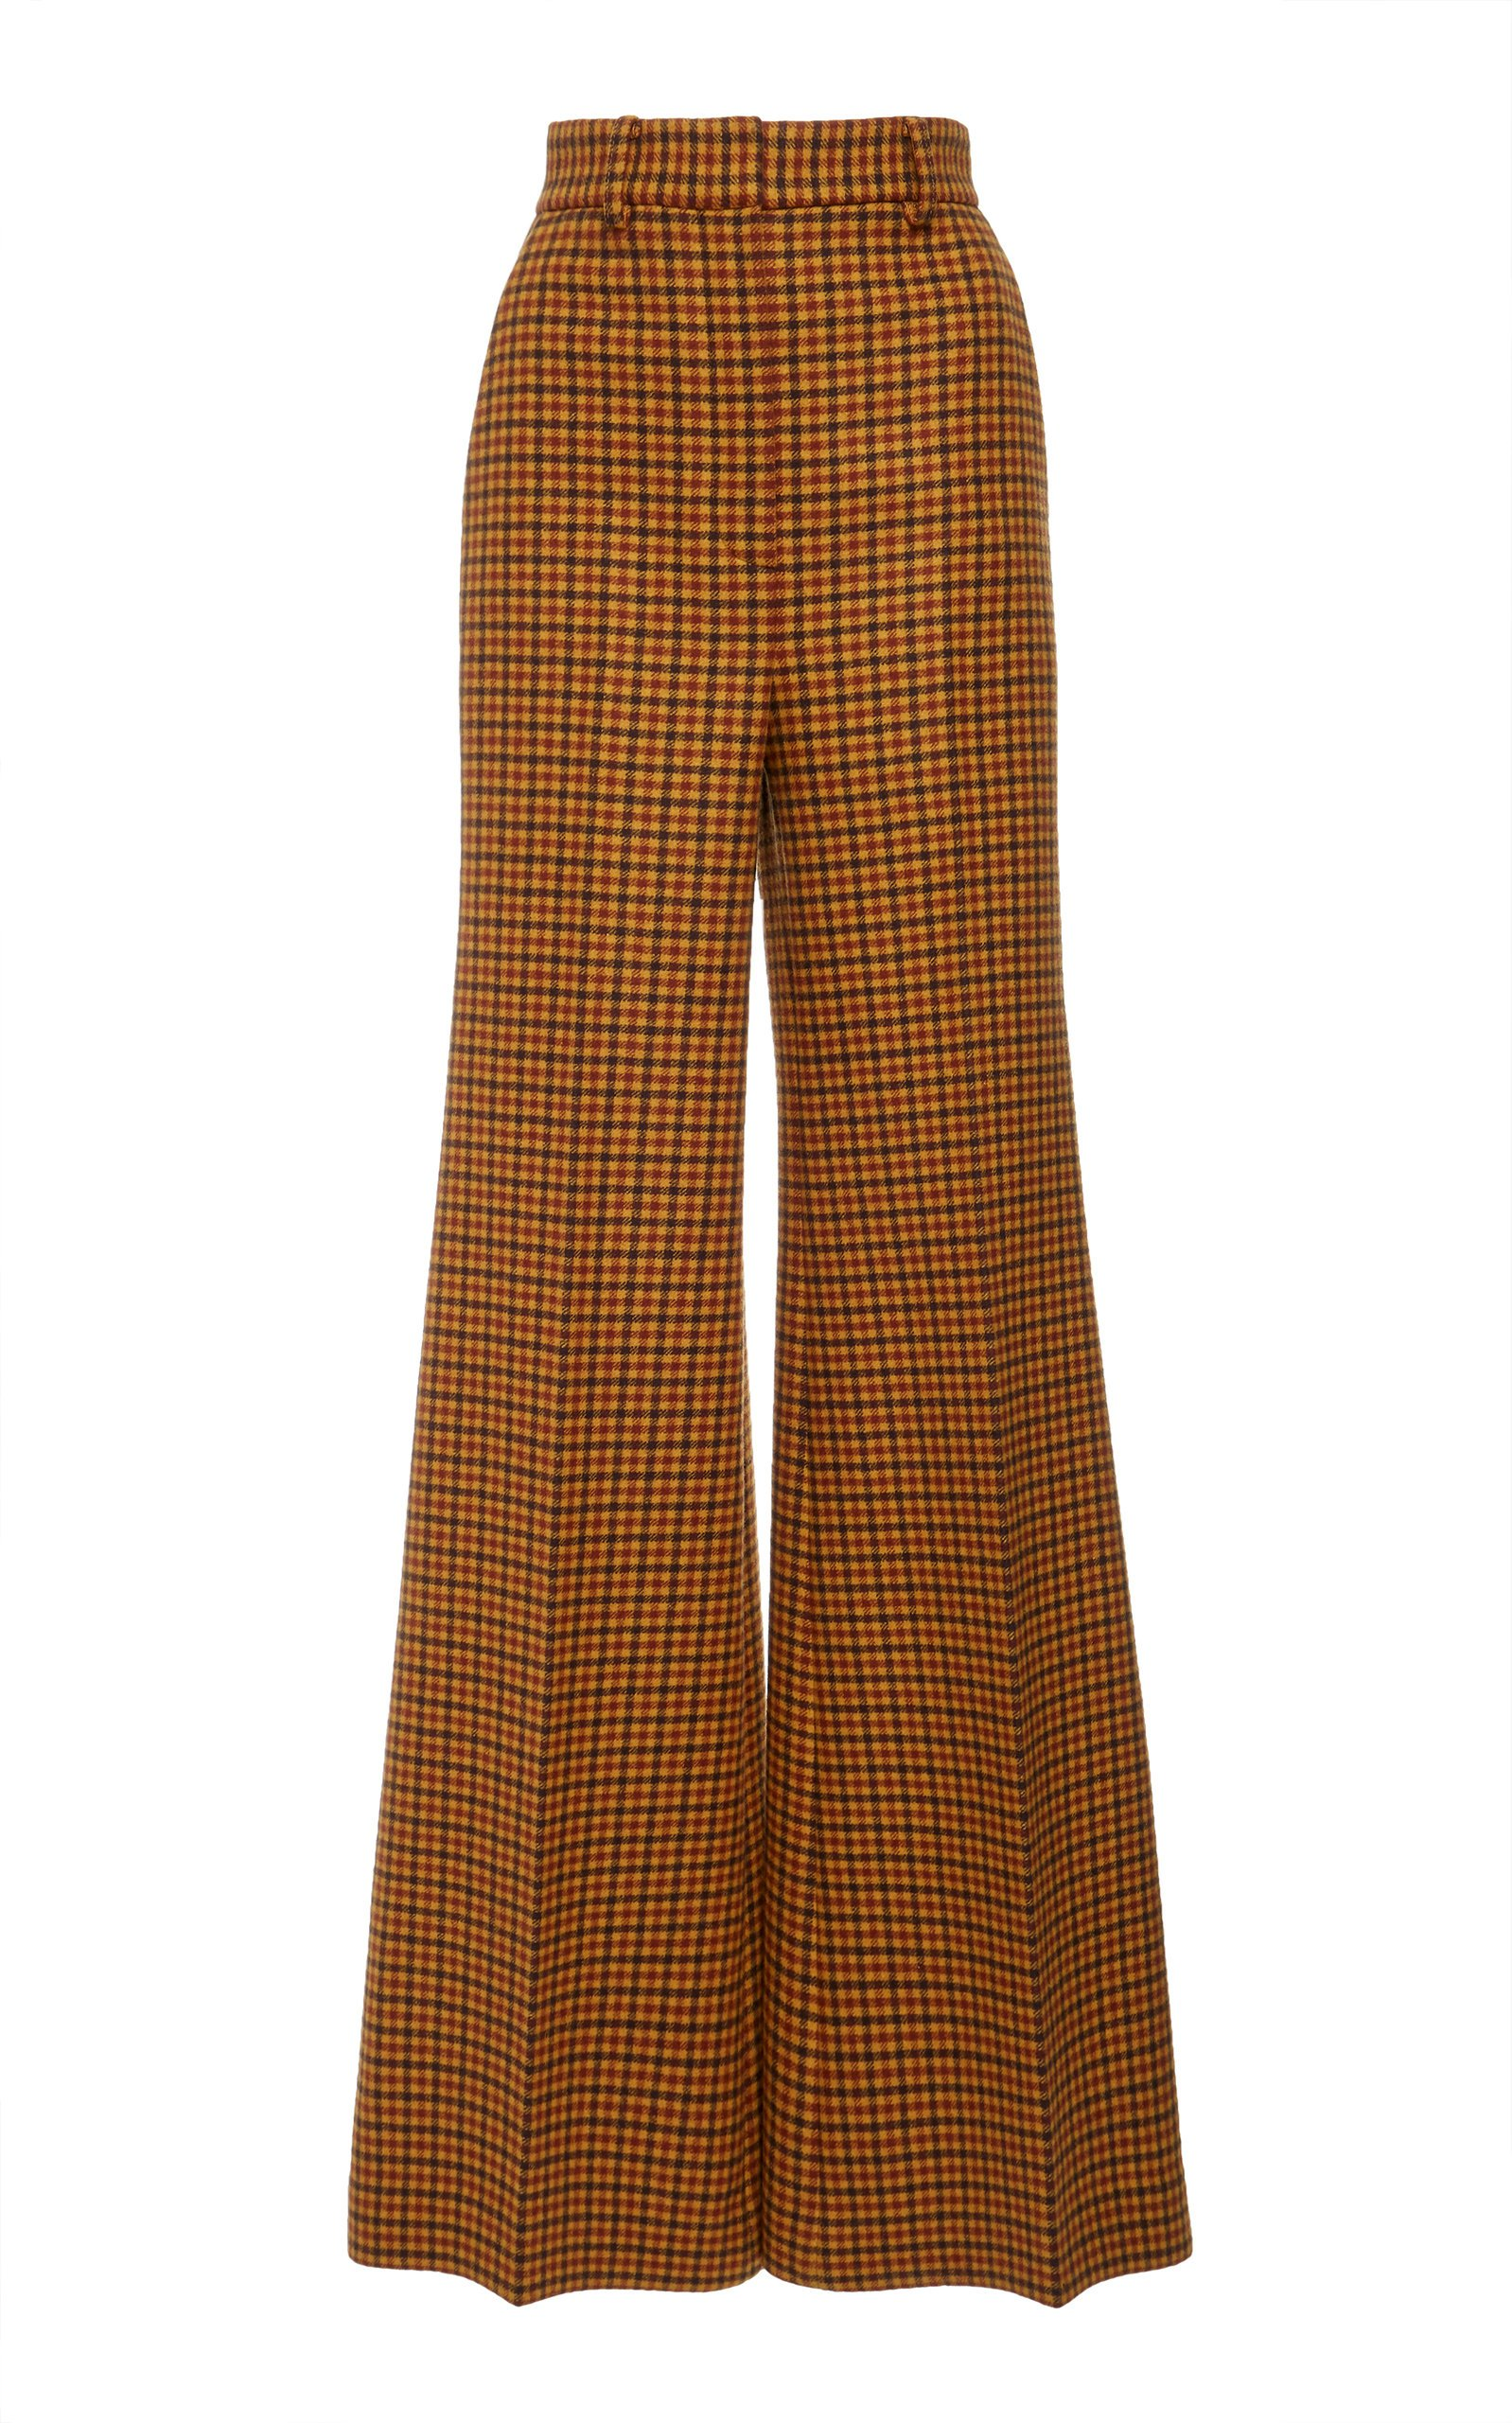 Bernadette Checked Wool Wide-Leg Pants by Khaite | Moda Operandi